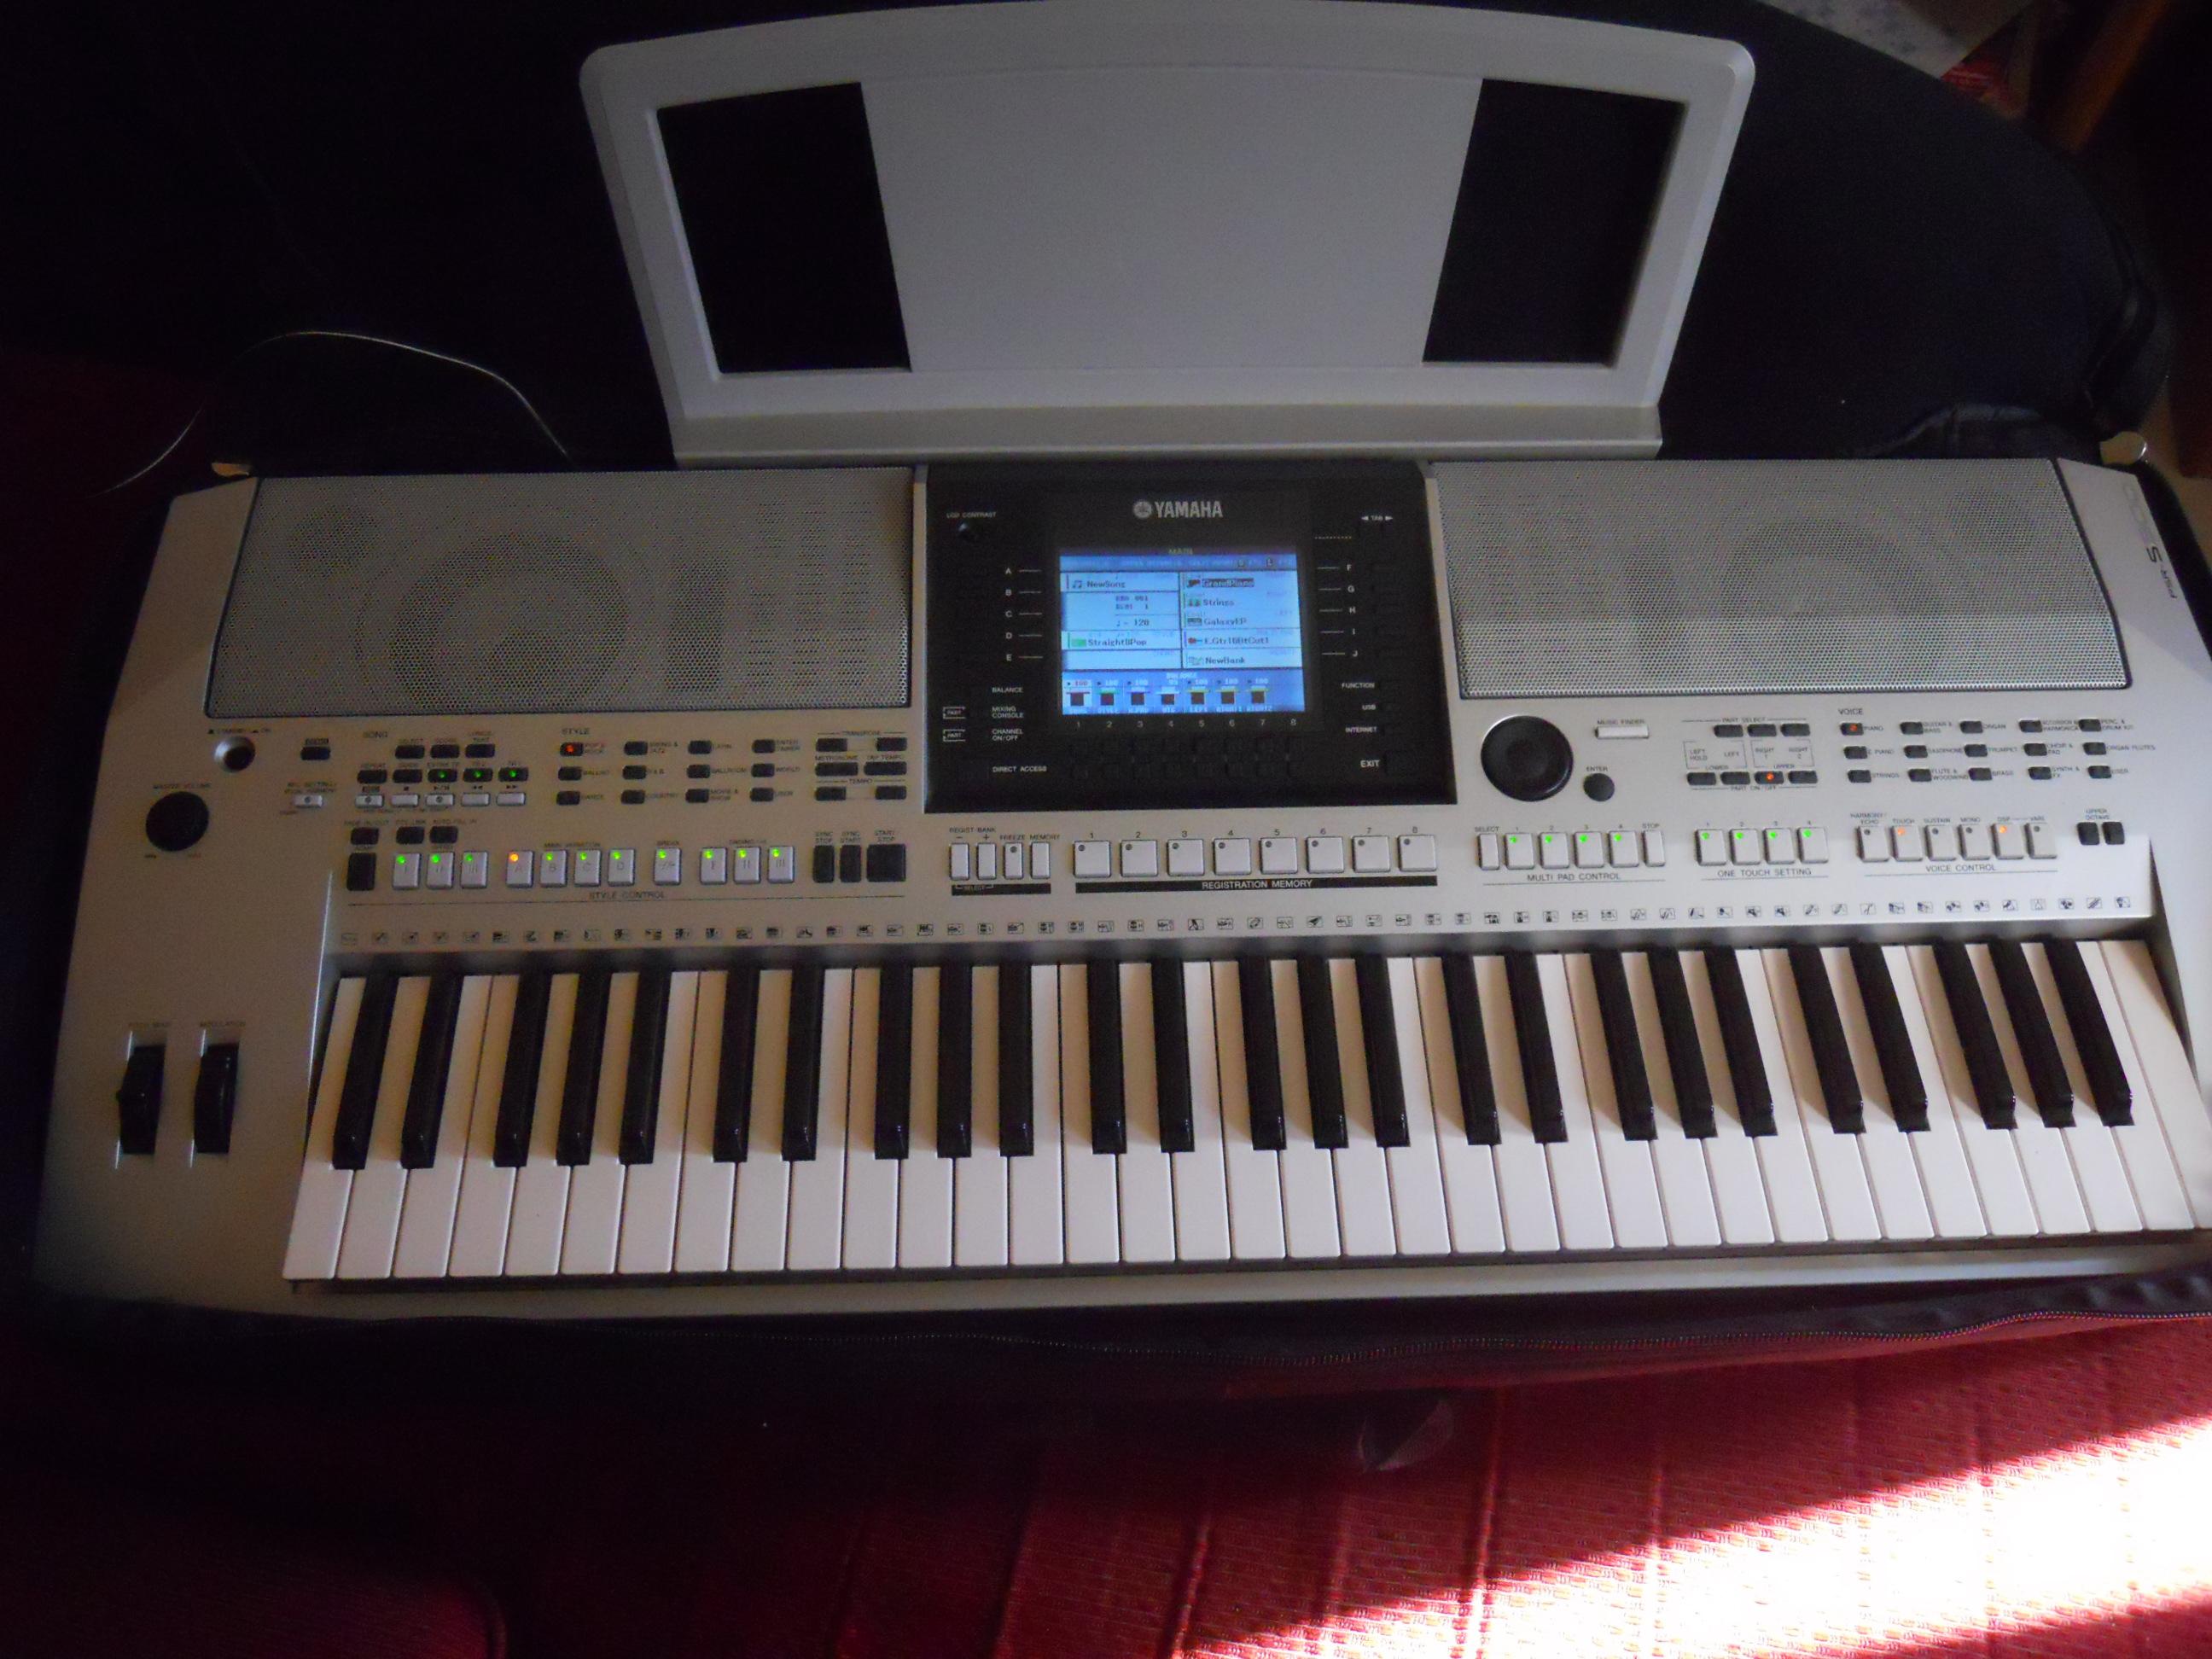 yamaha psr s900 image 274340 audiofanzine